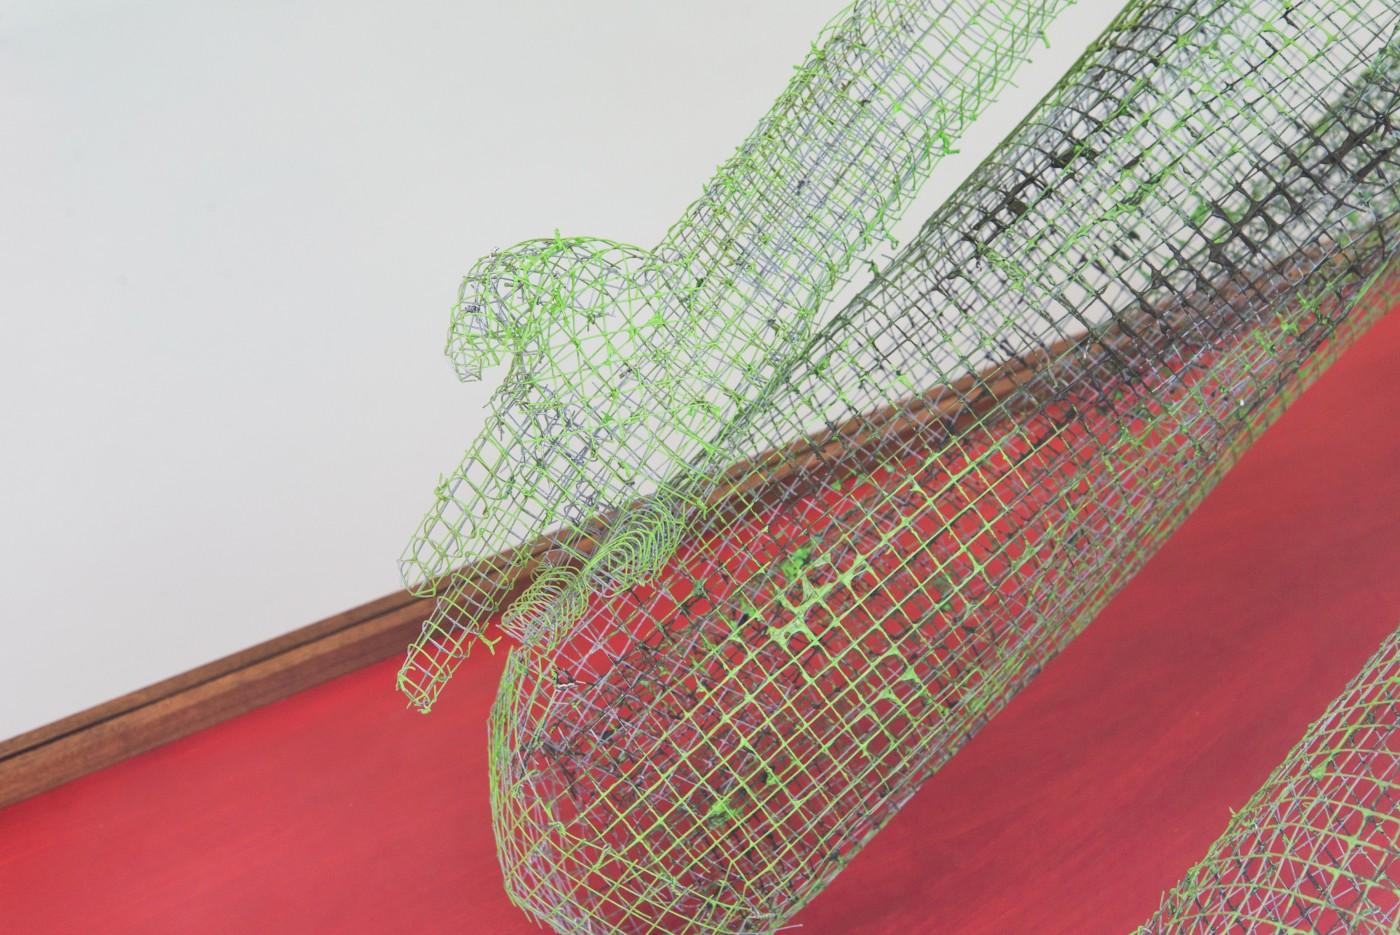 TOM HUMPHREYS  Figure Verte</I> (detail), 2018 Metal, paint, glass, wood 201 x 179 x 73 cm / 79.1 x 70.4 x 28.7 in